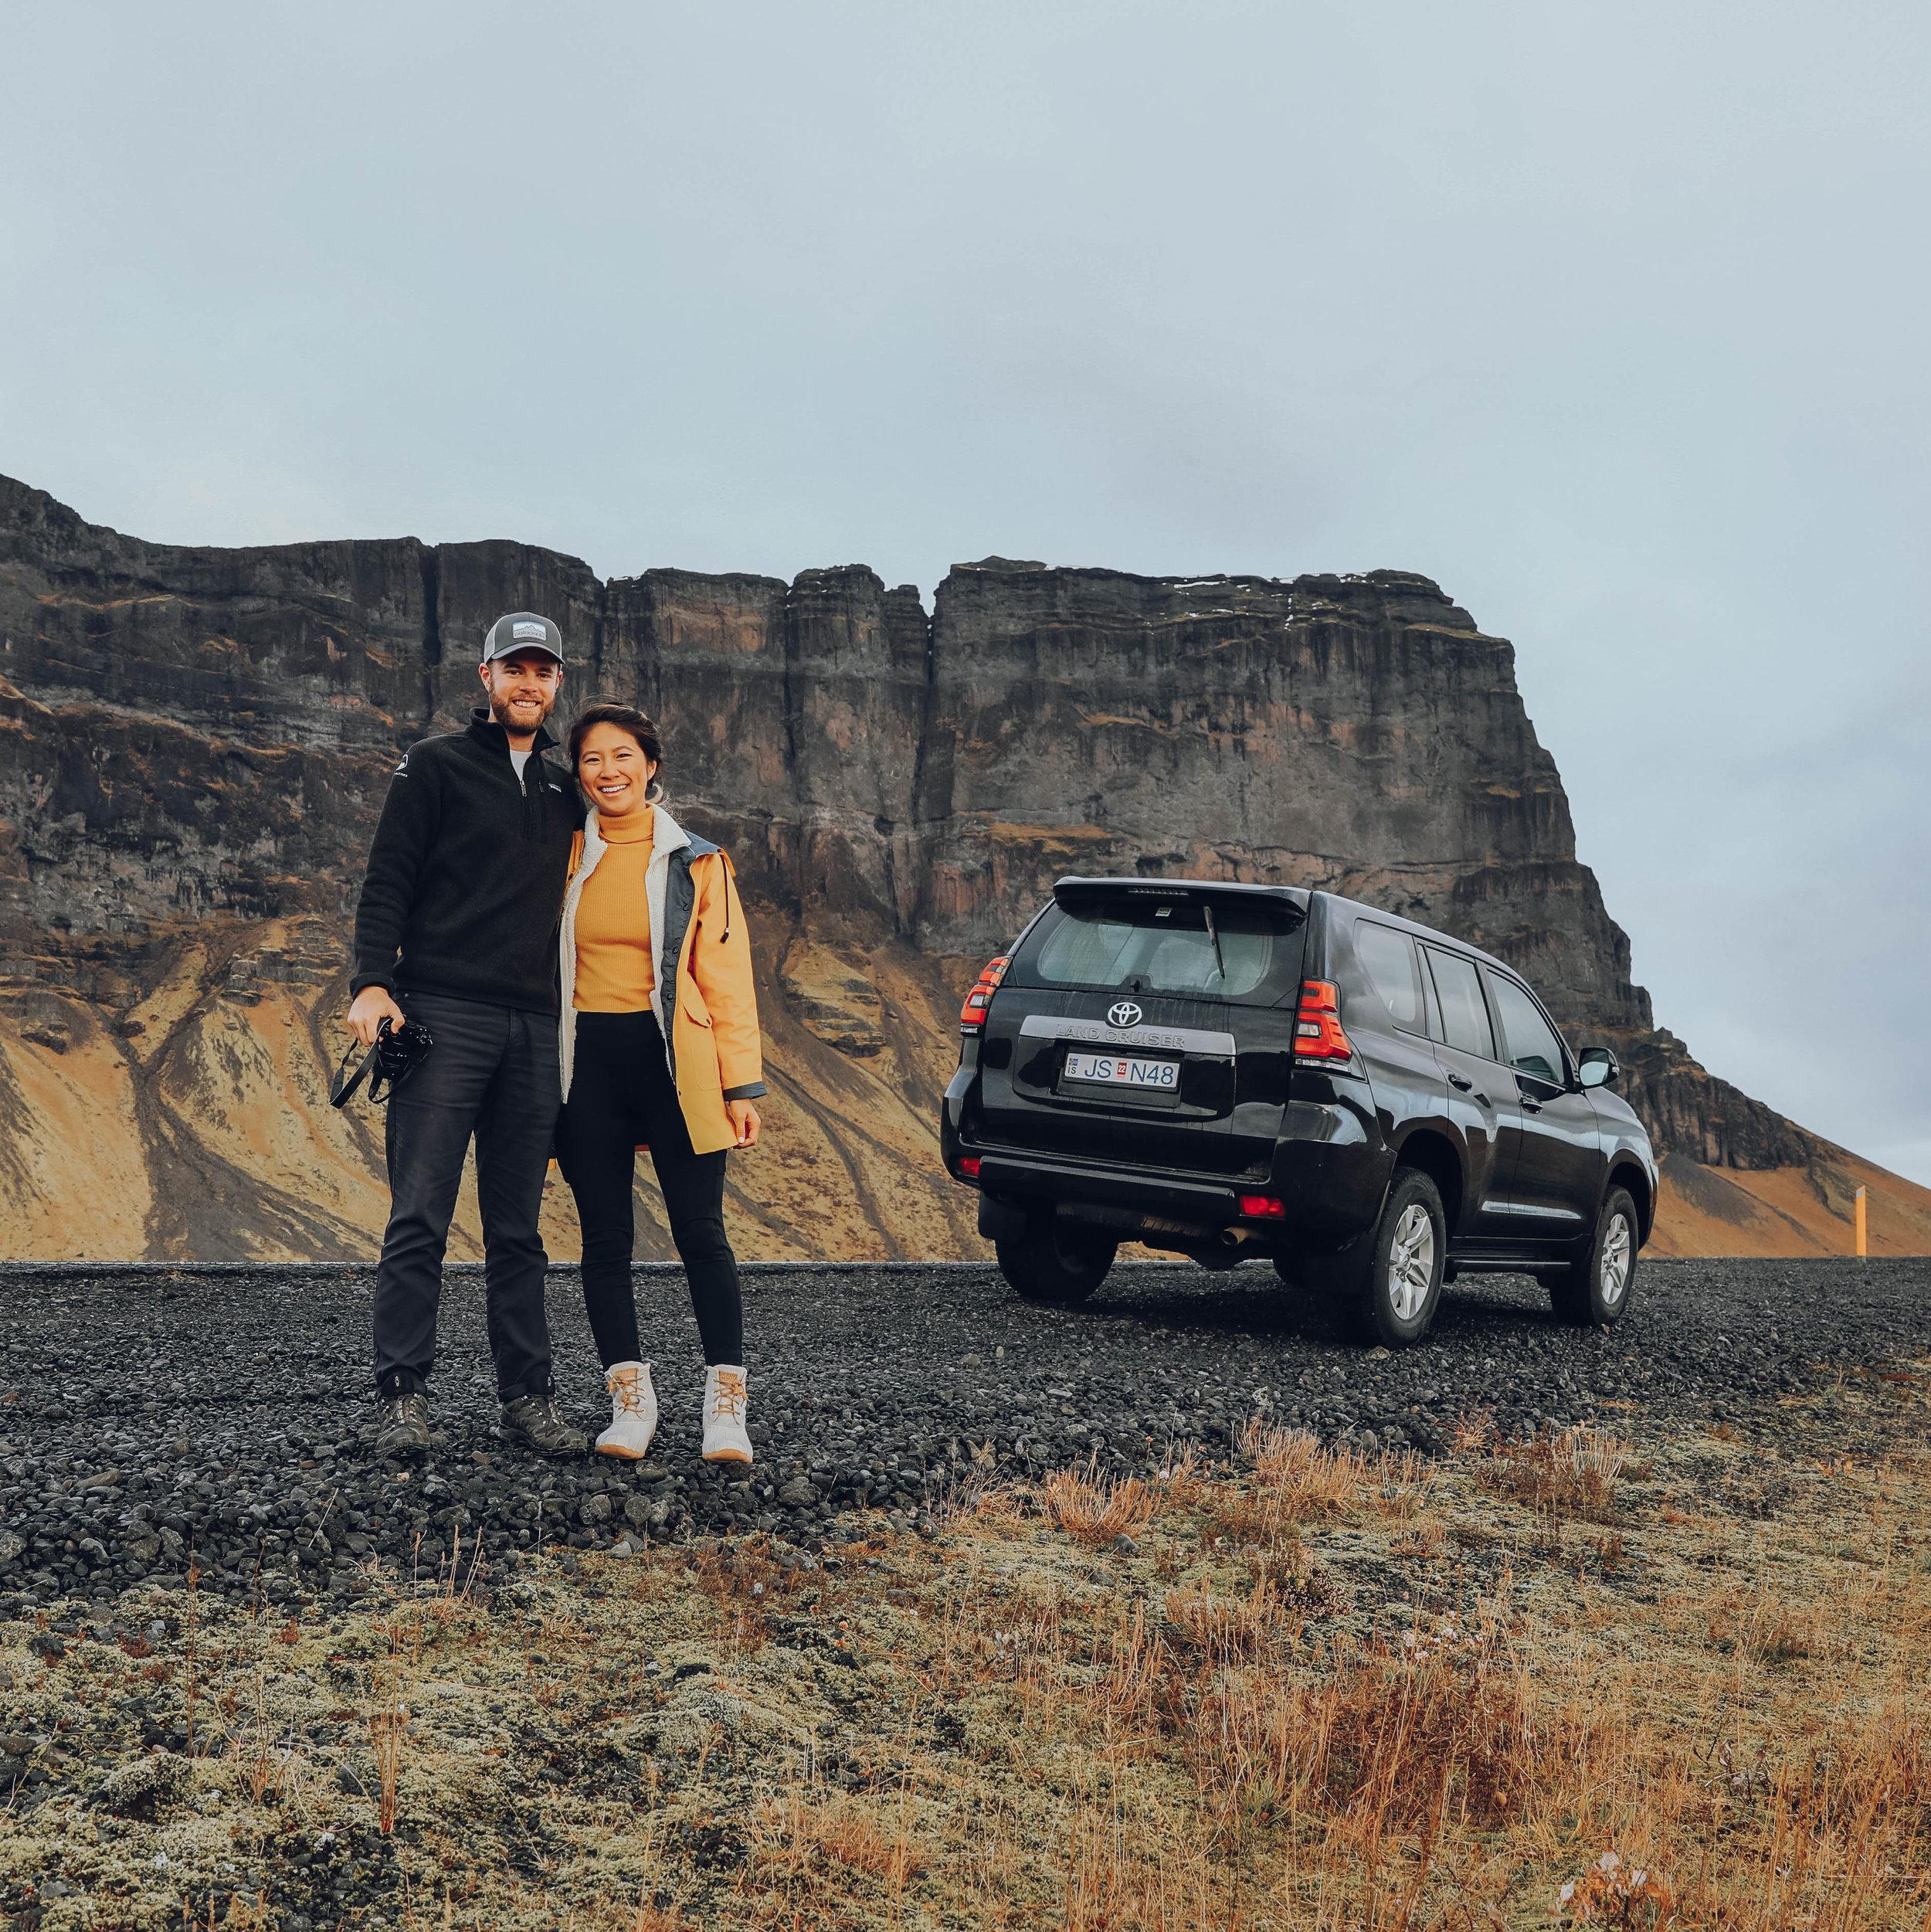 Iceland-Travel-Blog-Ally-Chen1.jpg